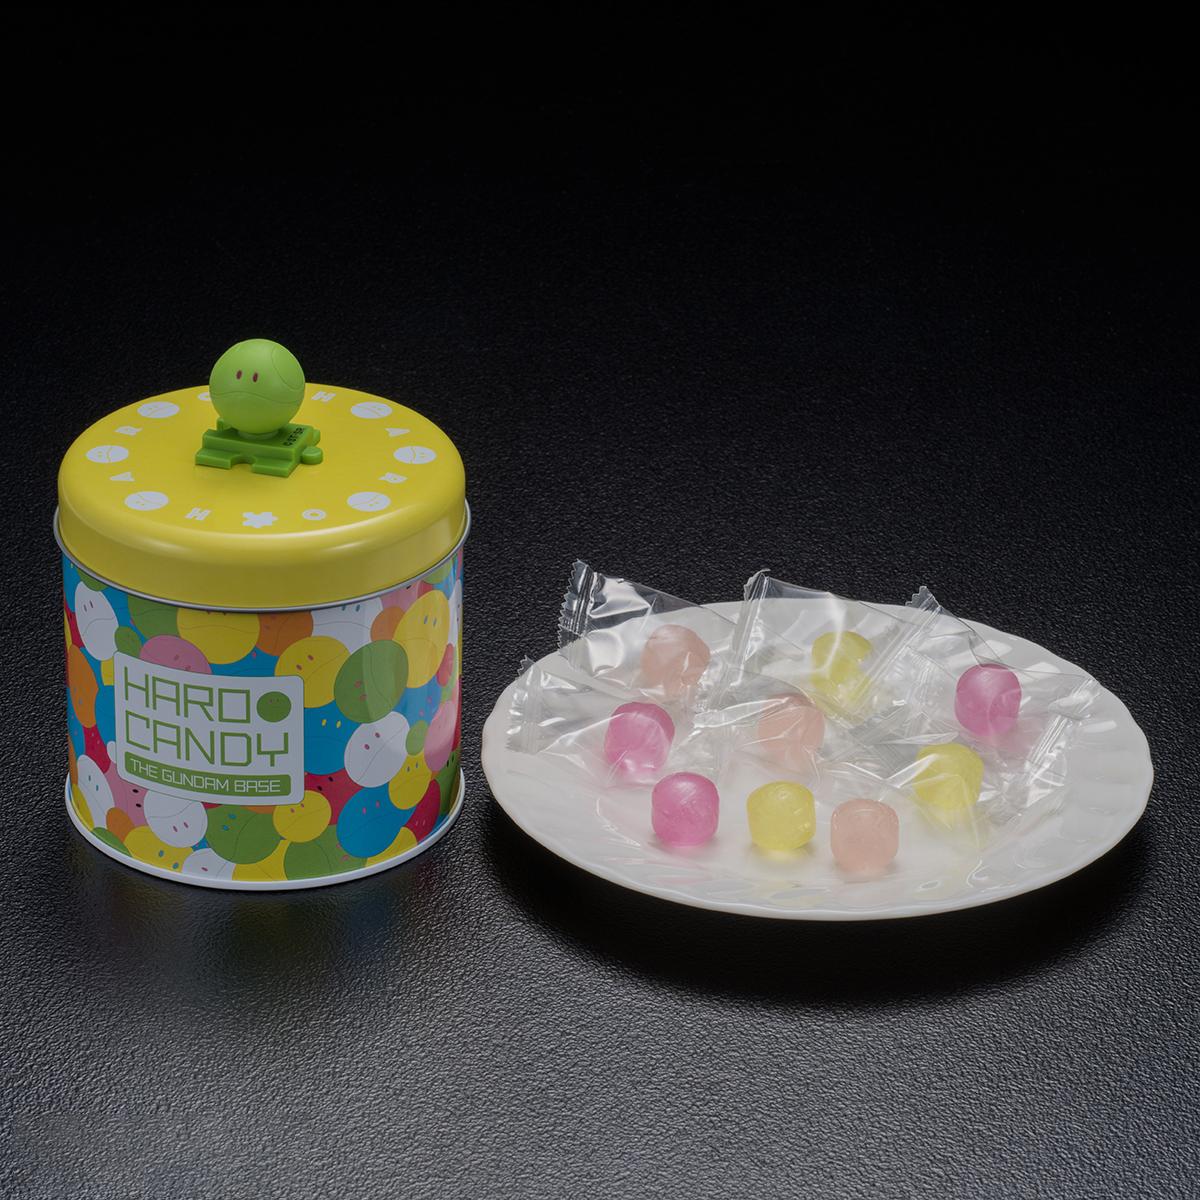 THE GUNDAM BASE ハロ缶キャンディ